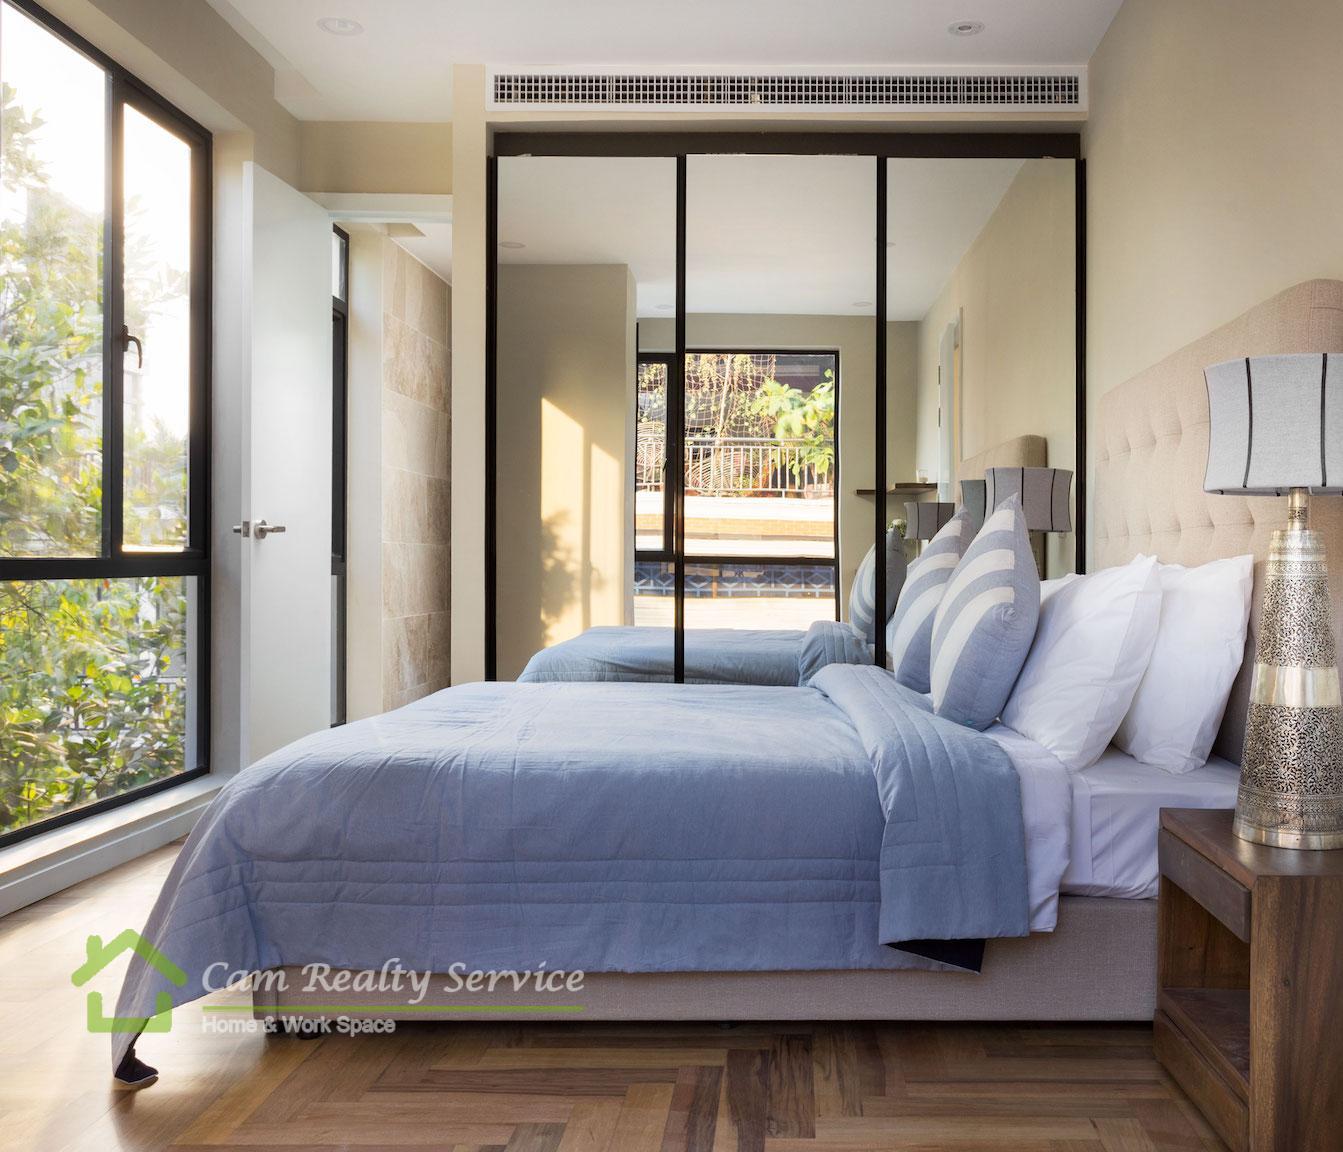 2-bedroom-master-bedroom-wardrobe-european-BKK1-condominium-cambodia-habitat-condos